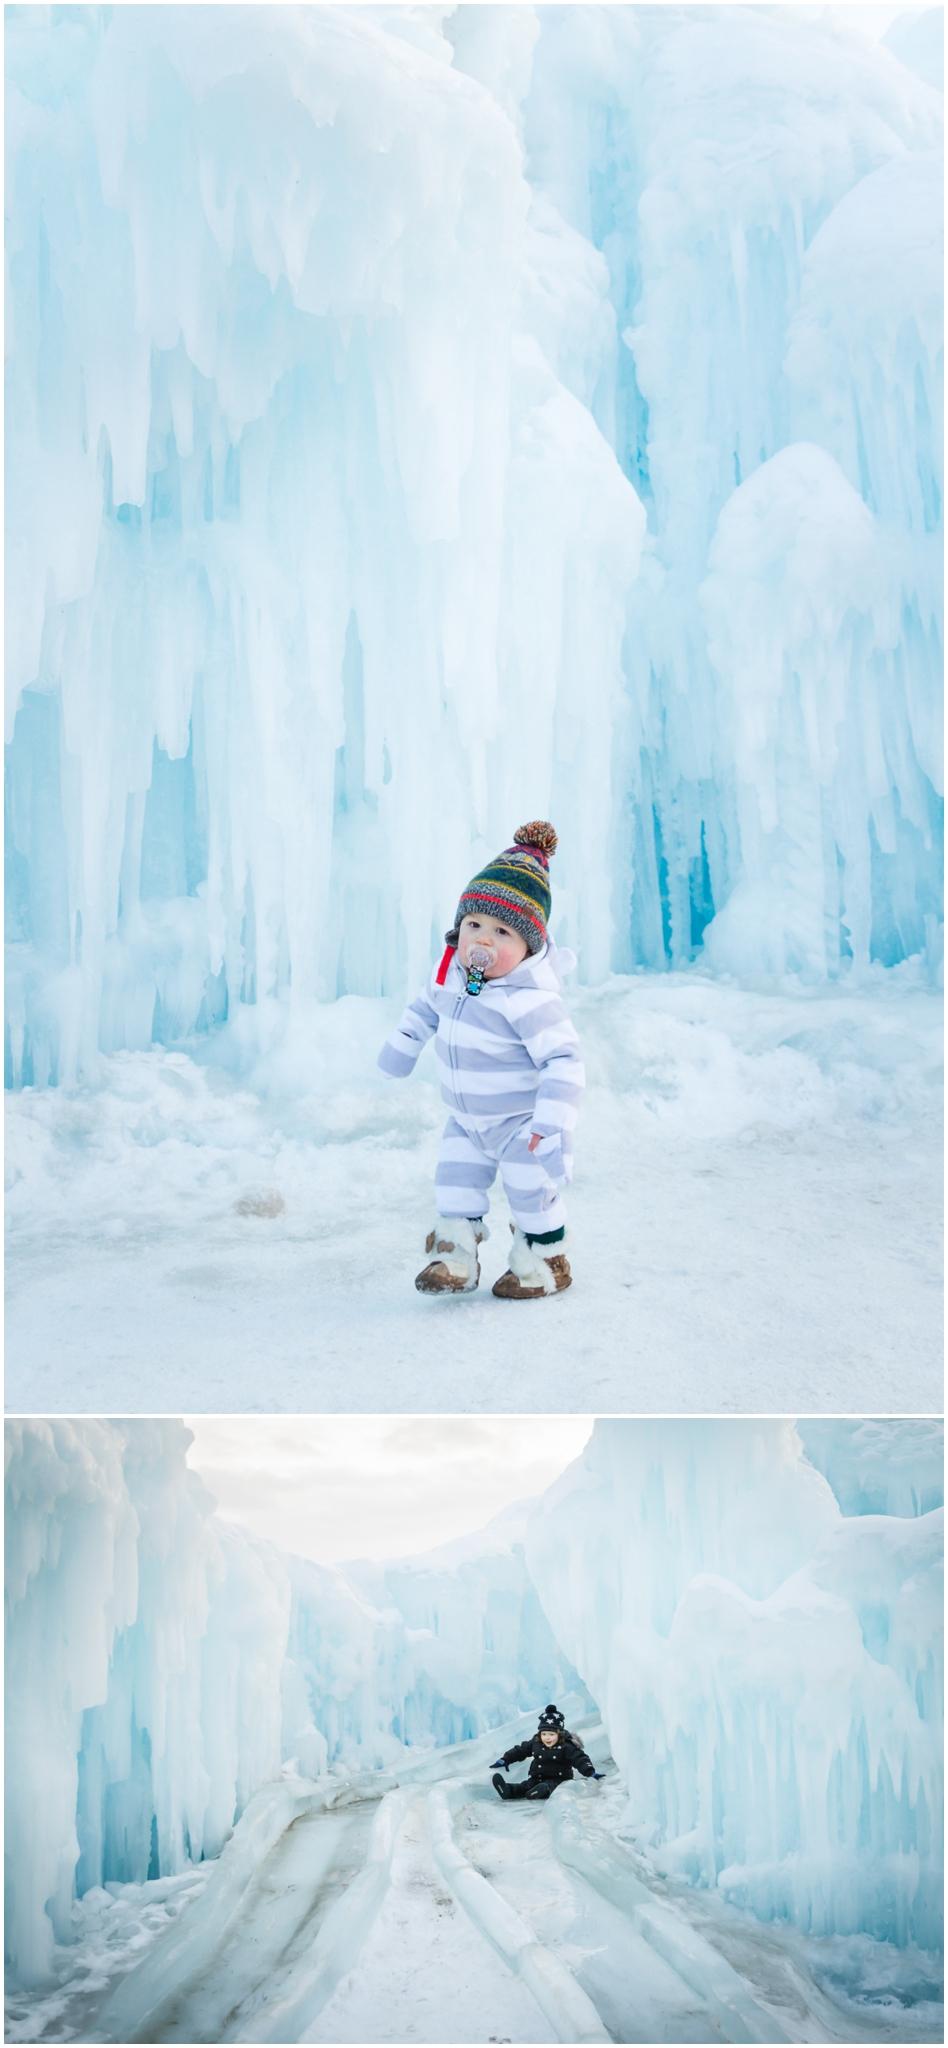 Edmonton Photographer - Best of 2016 YEG Ice Castle Ice Castles